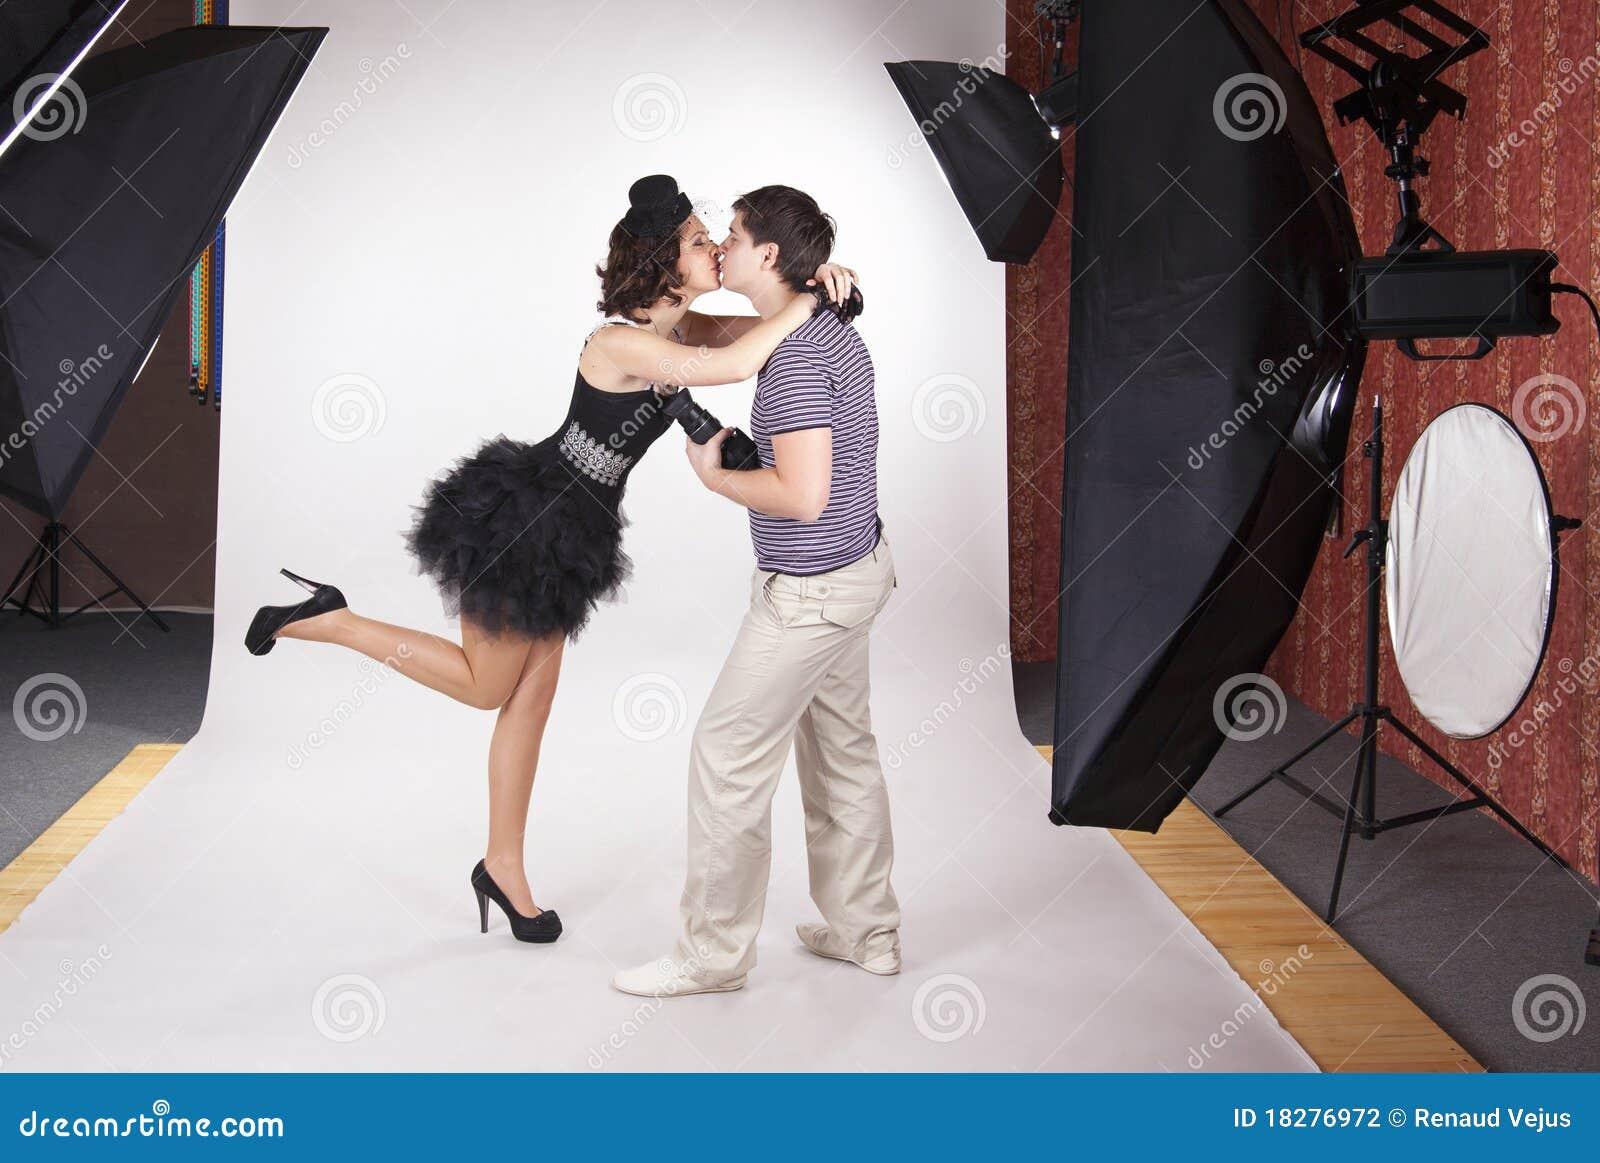 Modelo joven que besa al fotógrafo